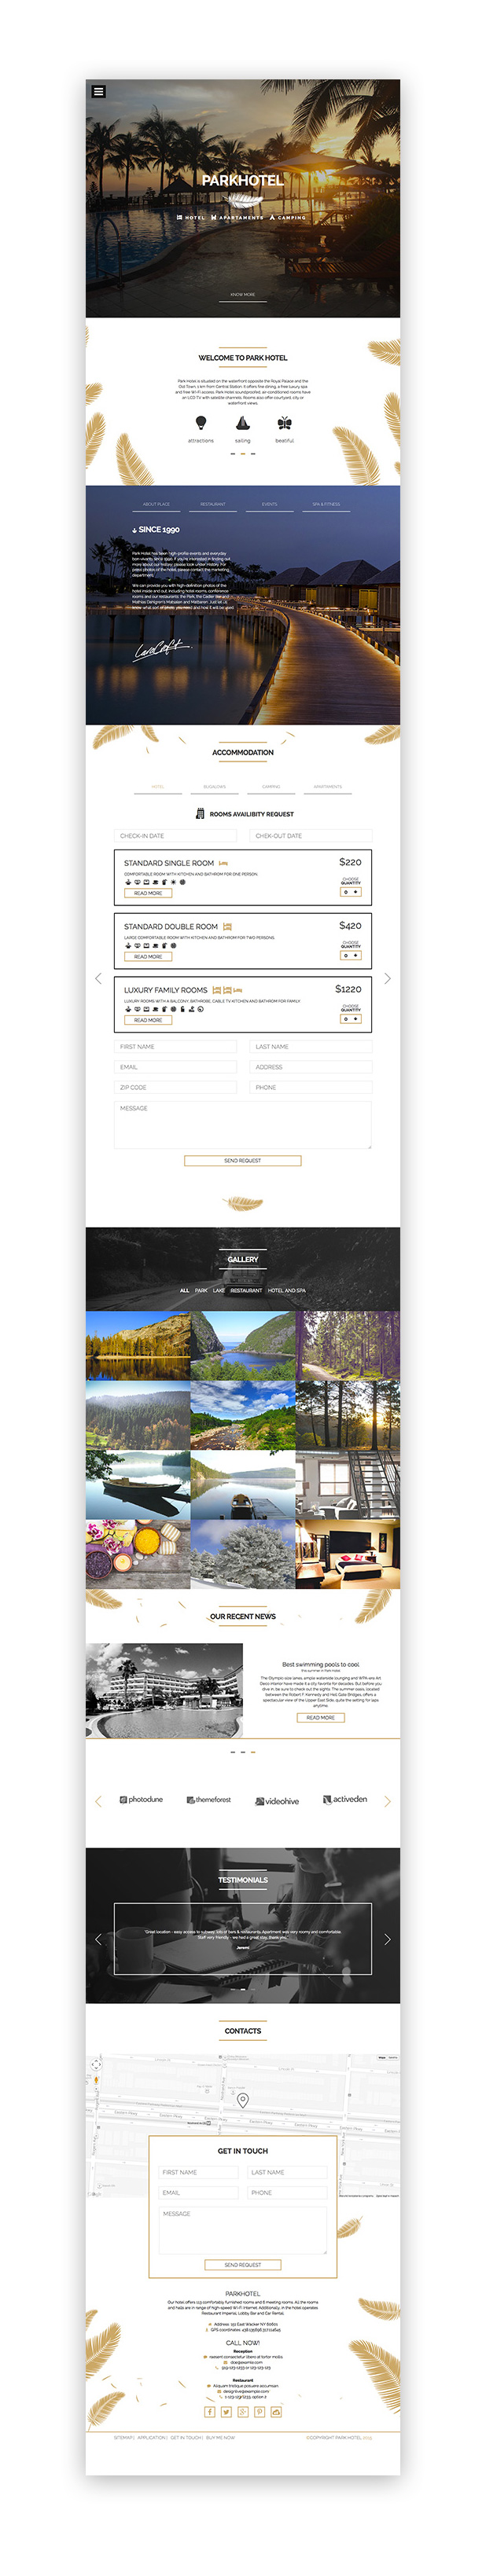 Parkhotel - Accommodation Multiple Designs HTML - 1